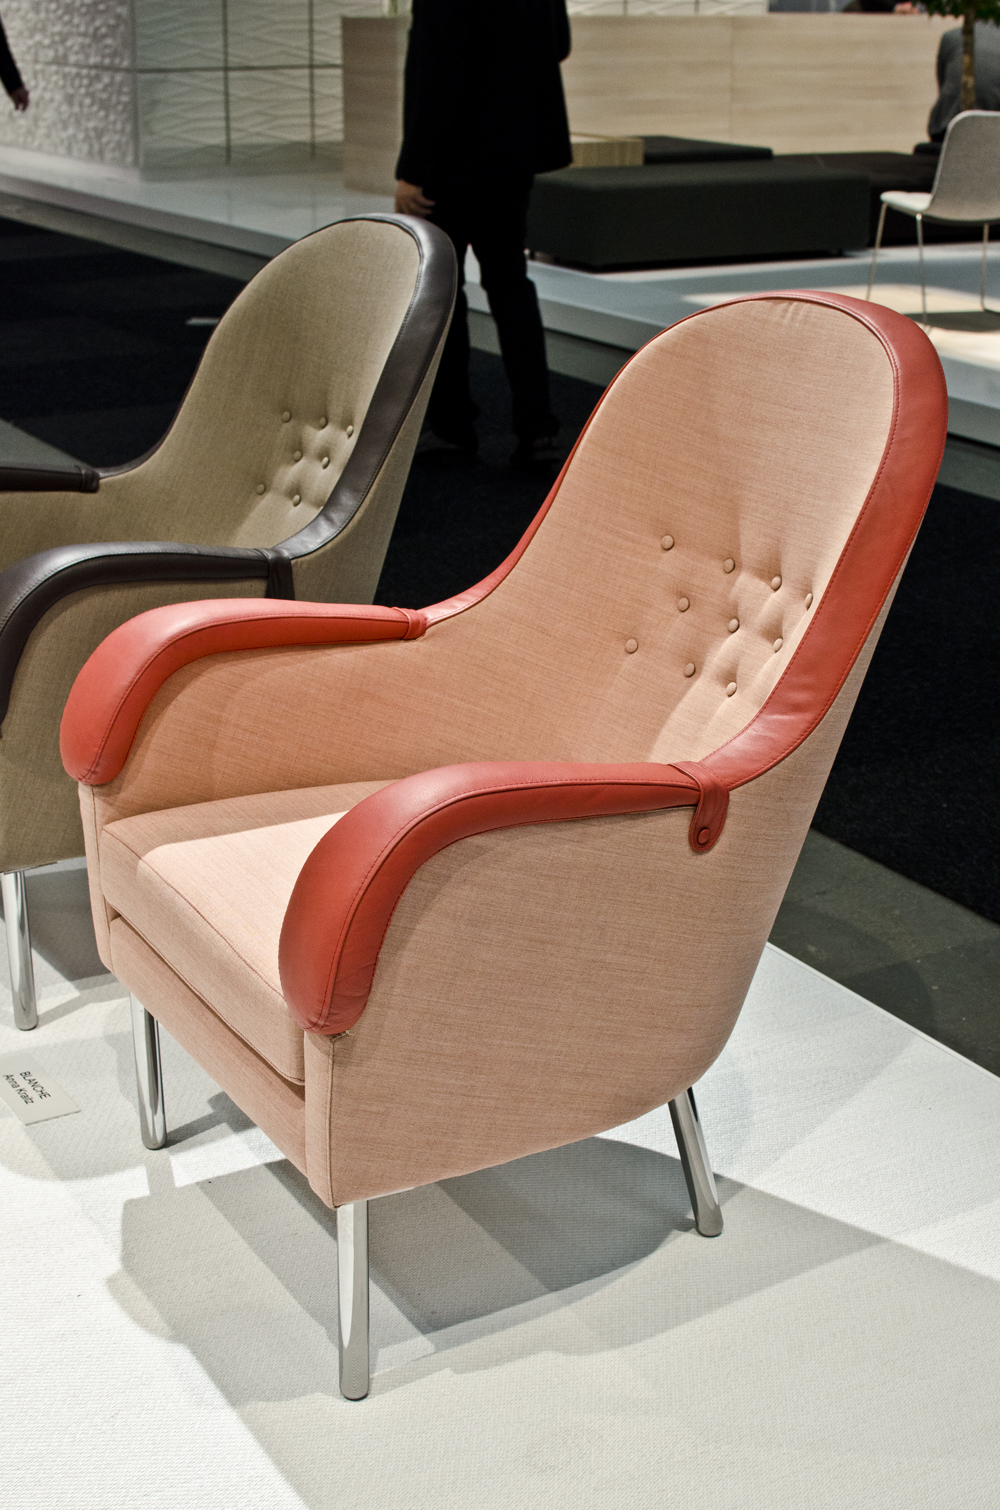 Stockholm Furniture Fair 2013 (10 favourites) – Husligheter.se